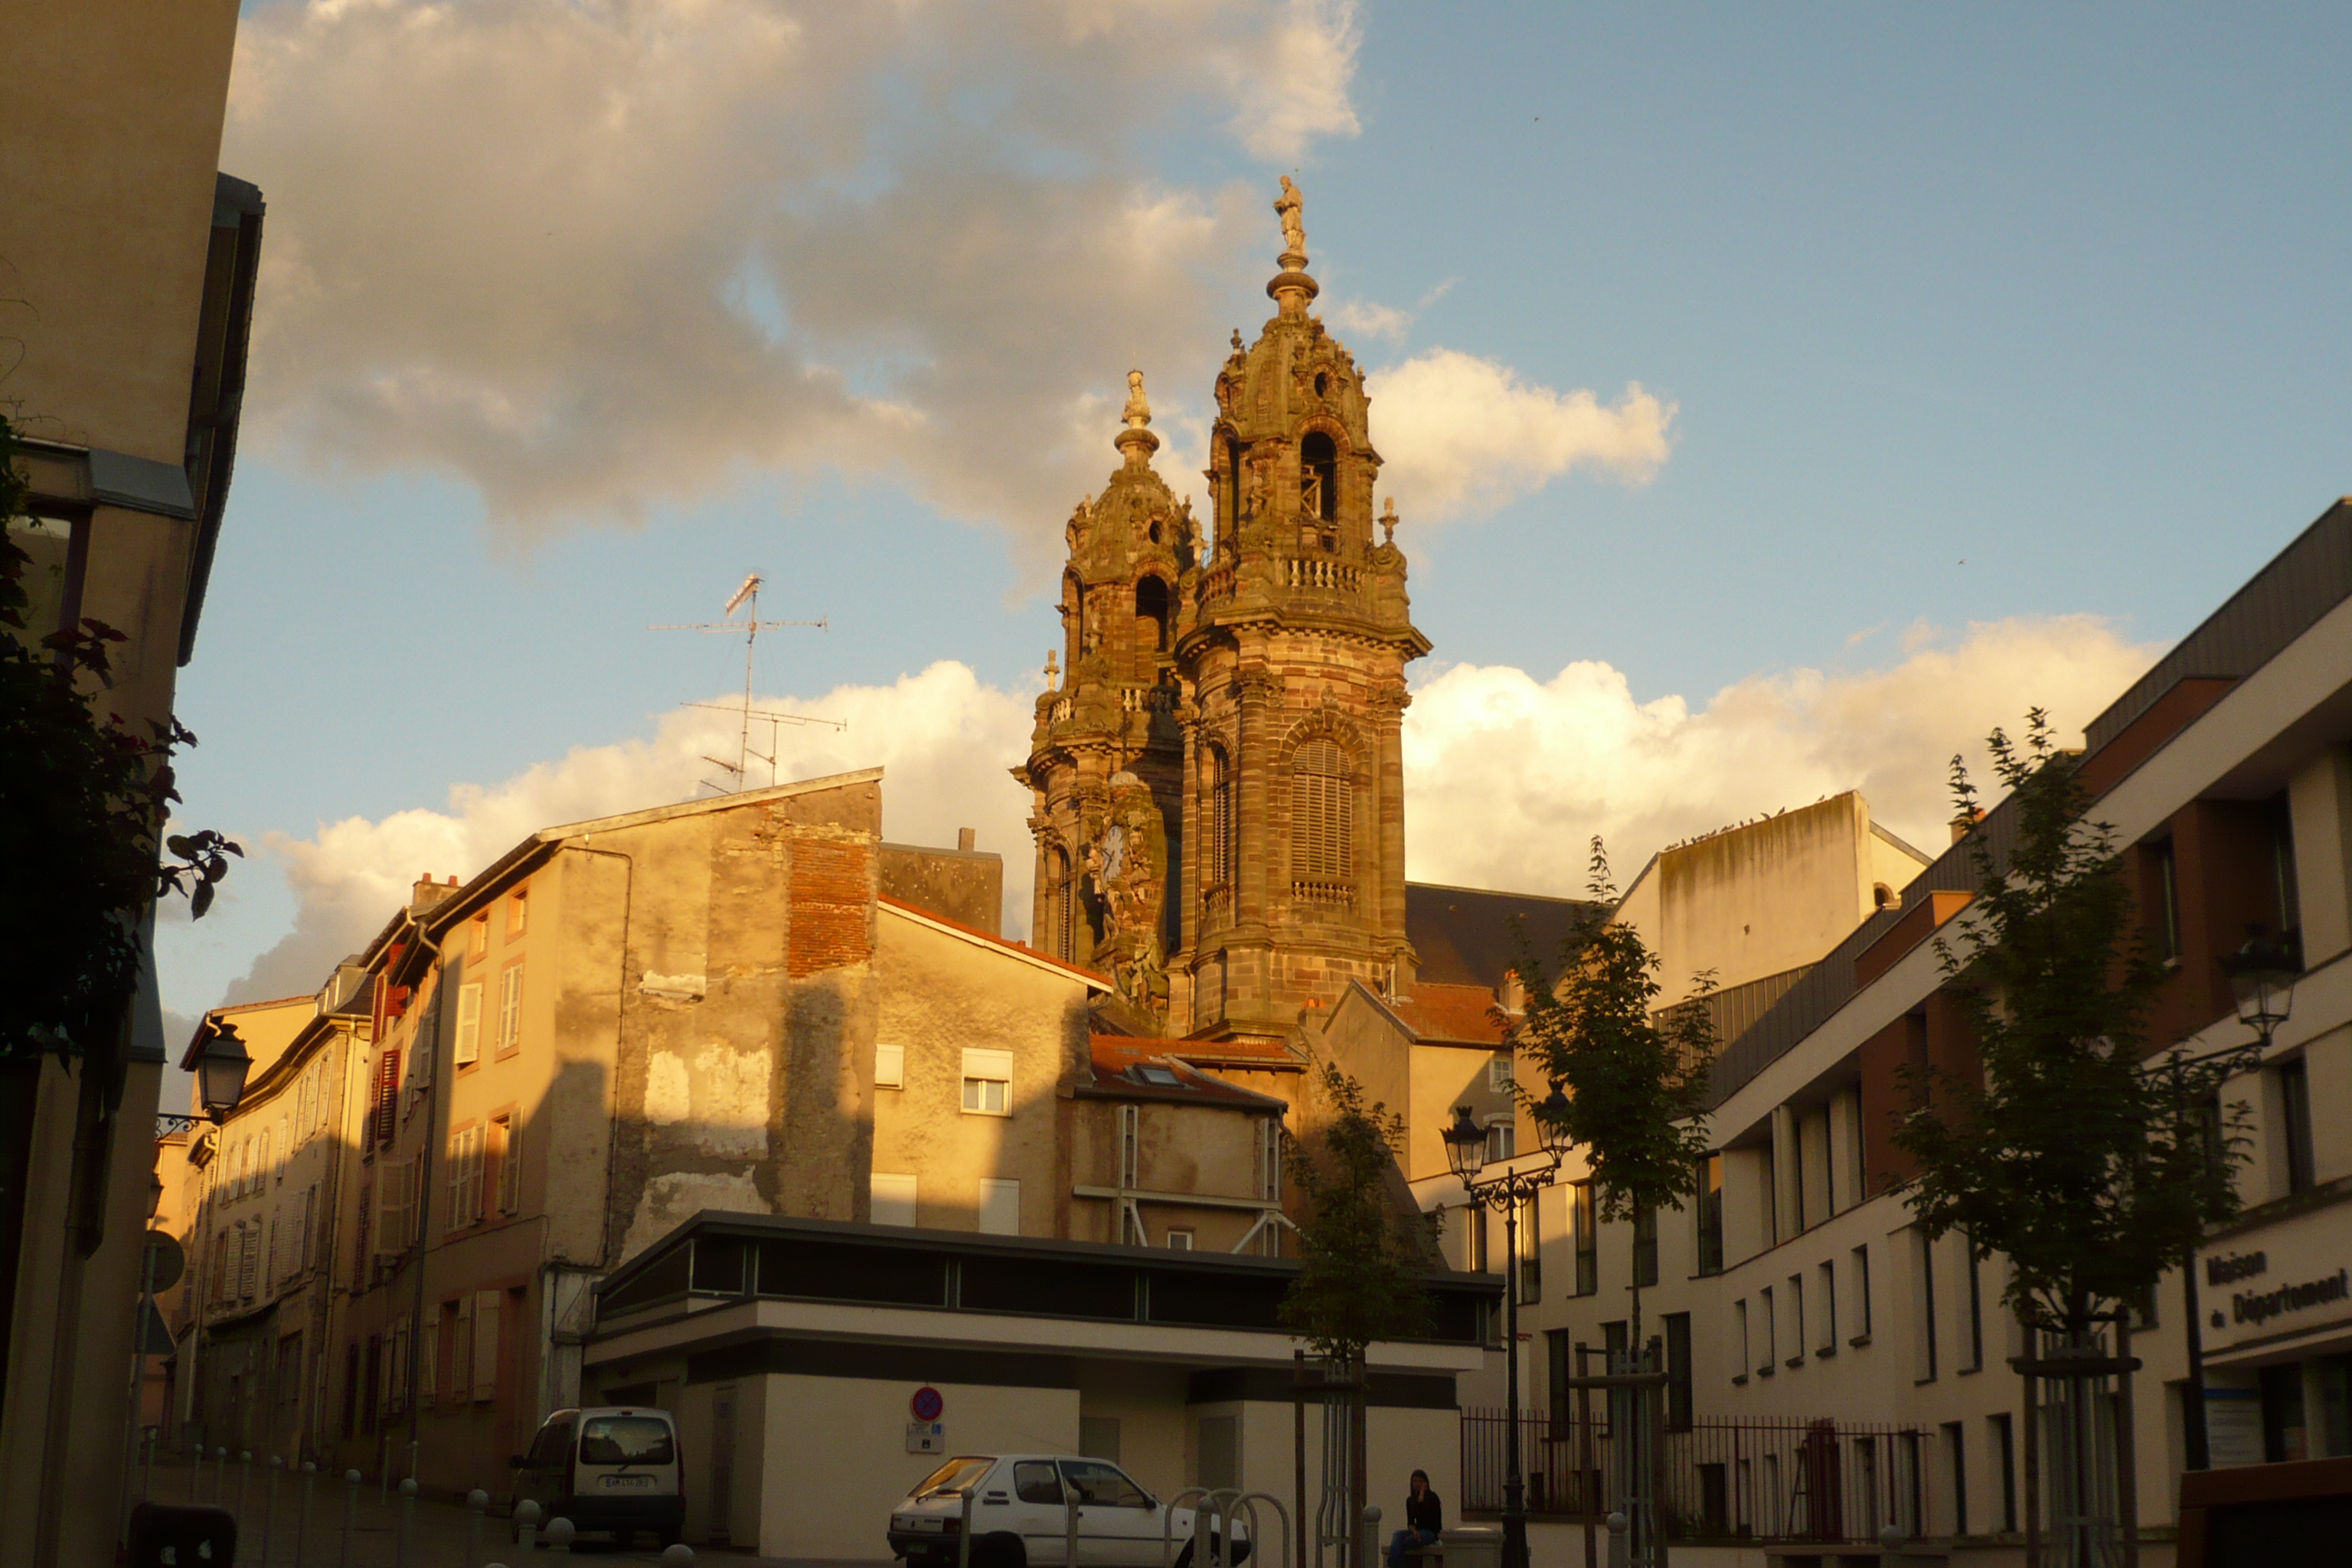 Luneville France  city photos : Church of Saint Jacques in Luneville France seen from Rue de la ...